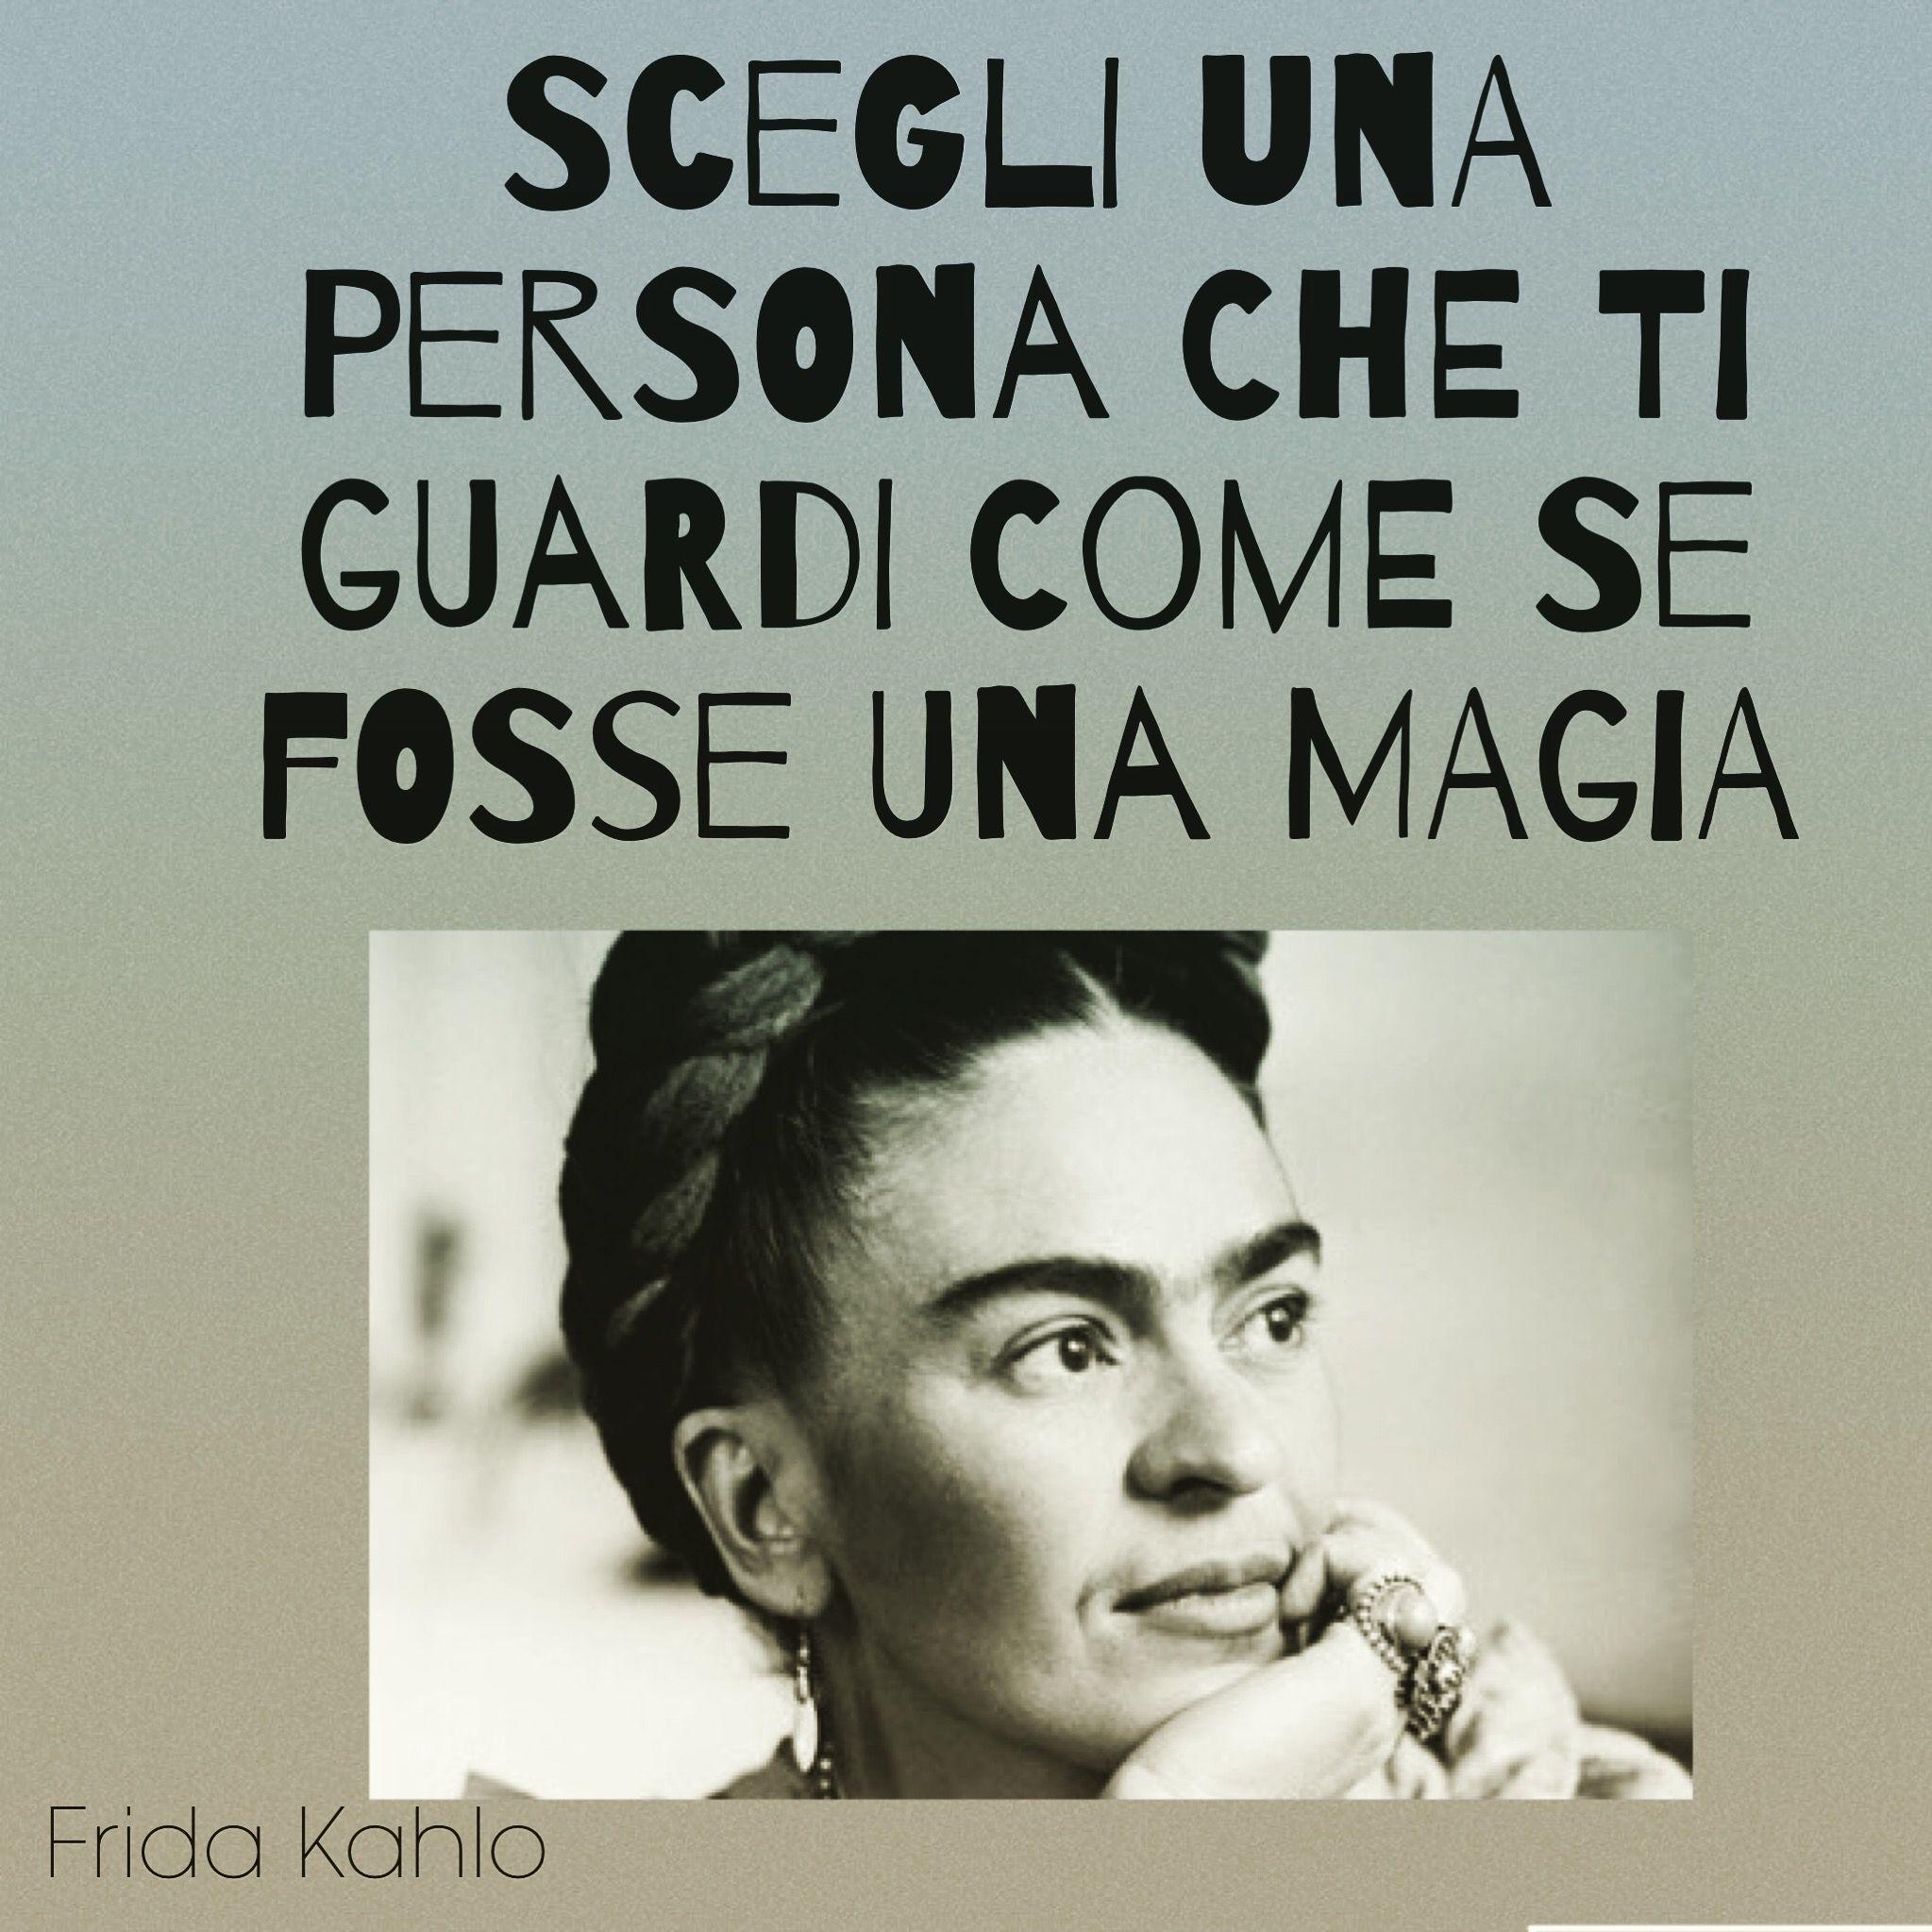 Frida Kahlo Citazioni Citazioni Citazioni Motivazionali E